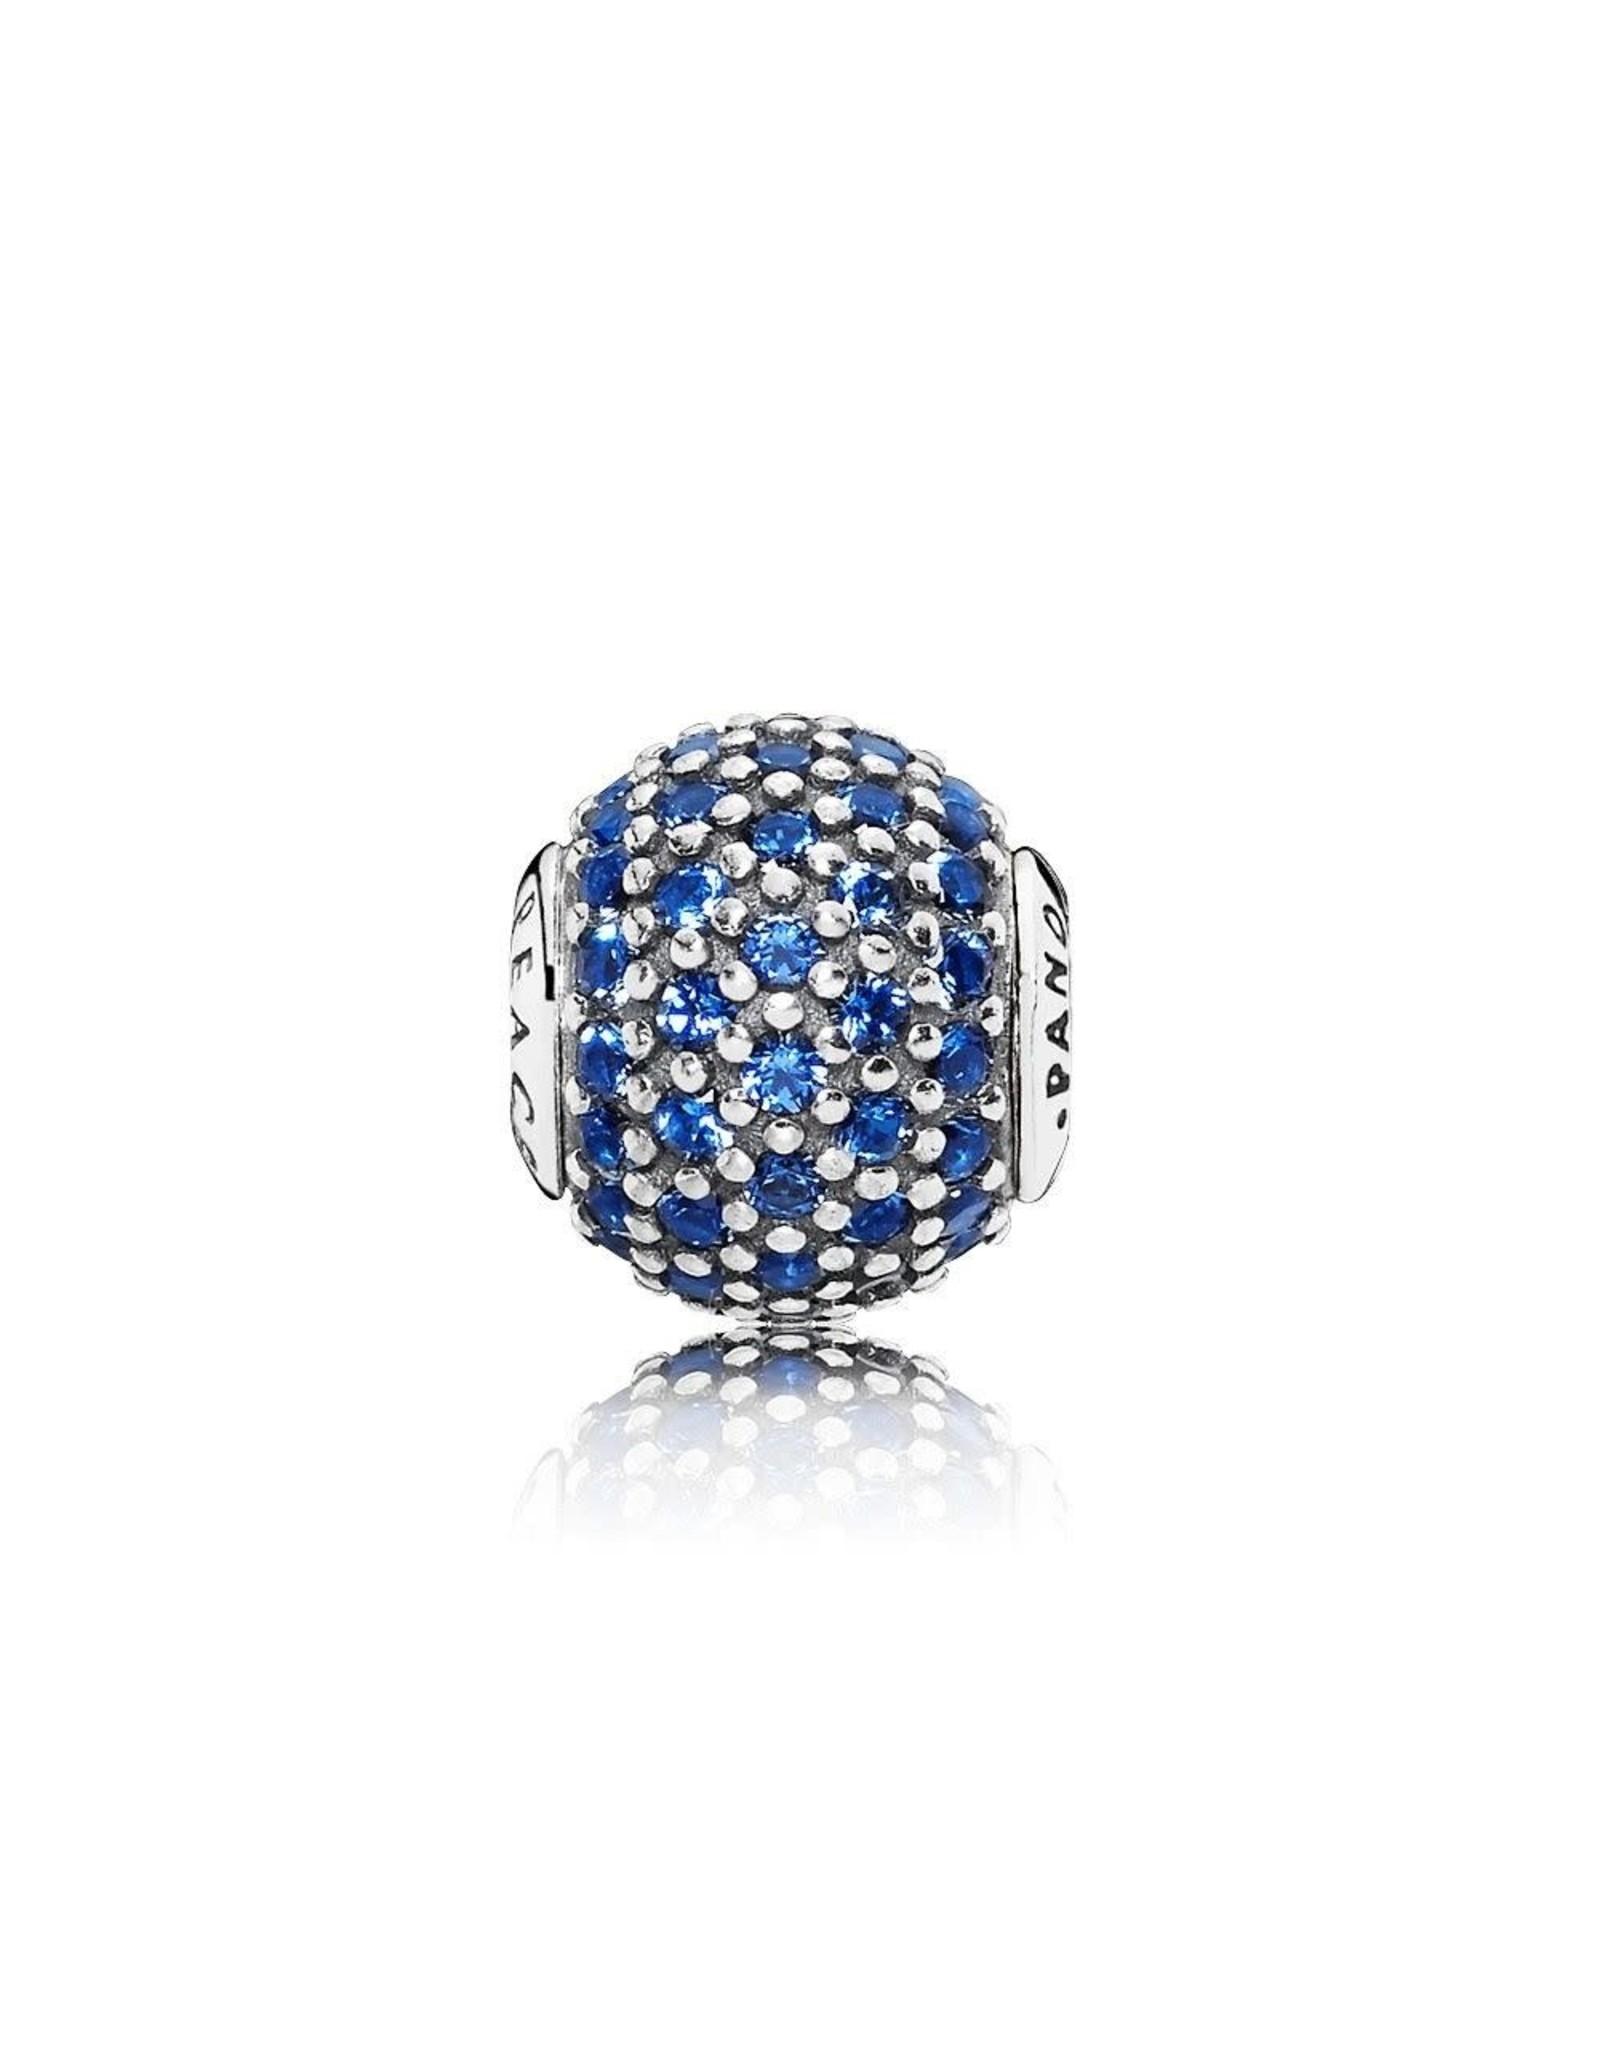 Pandora Pandora Essence Charm, Peace, Royal Blue CZ